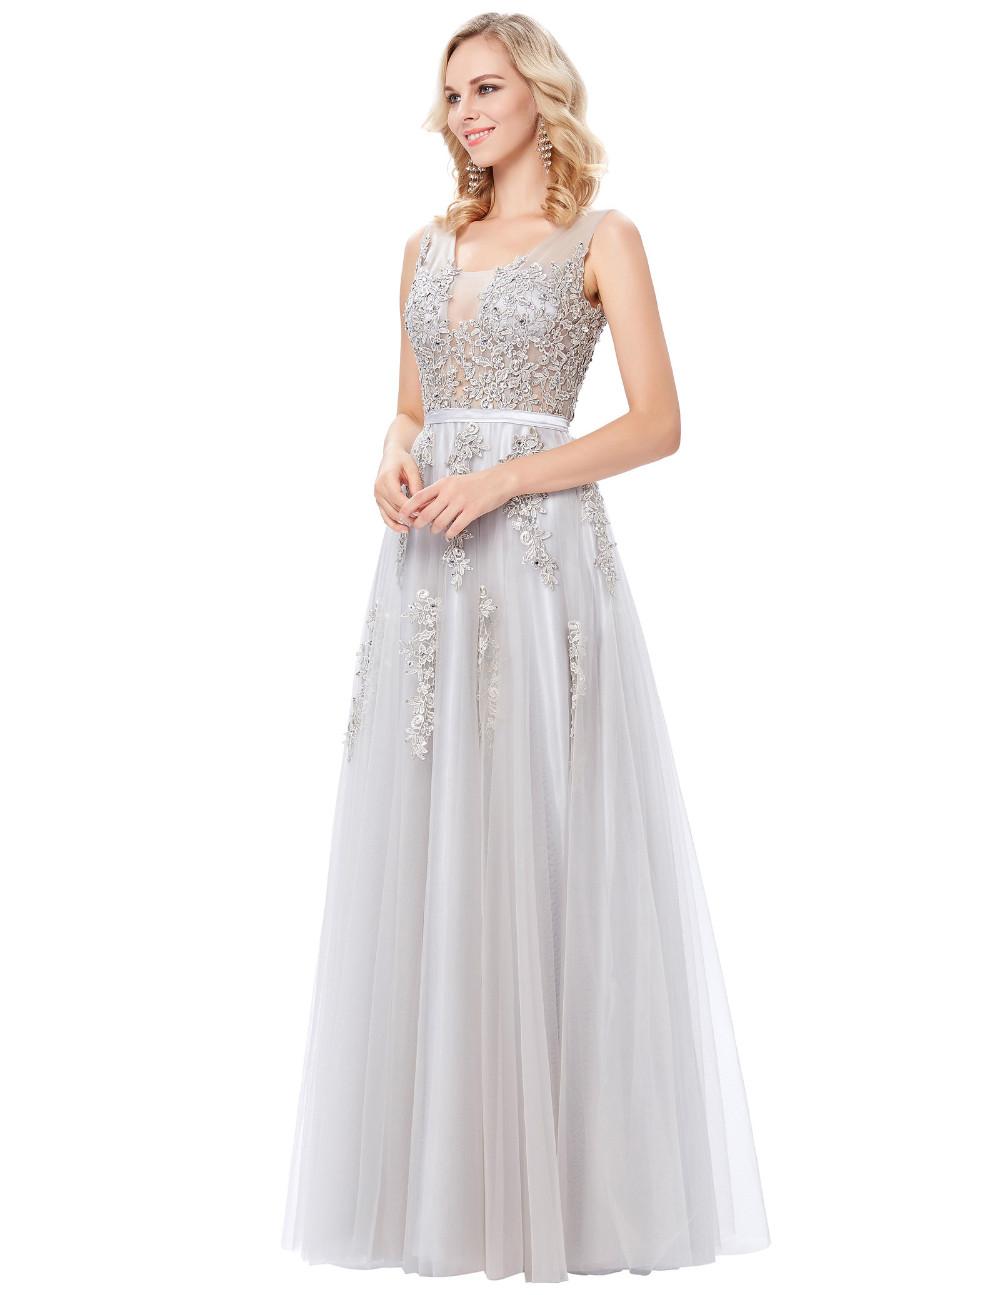 Grace Karin Tulle Appliques Celebrity Prom Dress Sexy V Back Sleeveless Long Royal Blue Robes De Soiree 2017 Longue Prom Dresses 22